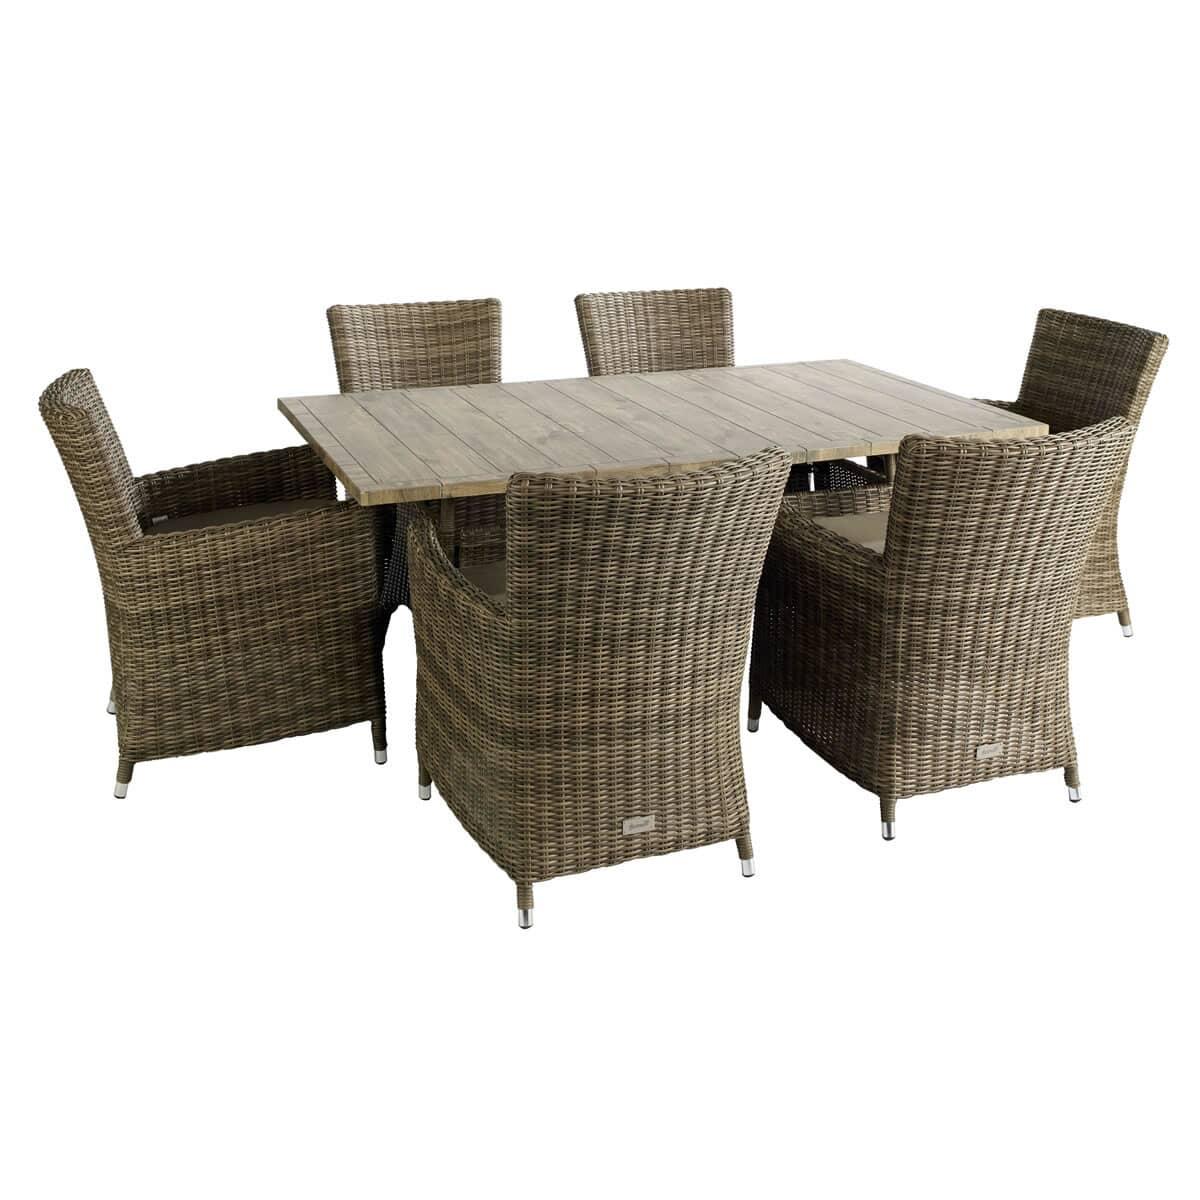 Hartman Semerang Ceramic Rectangular 6 Seat Set